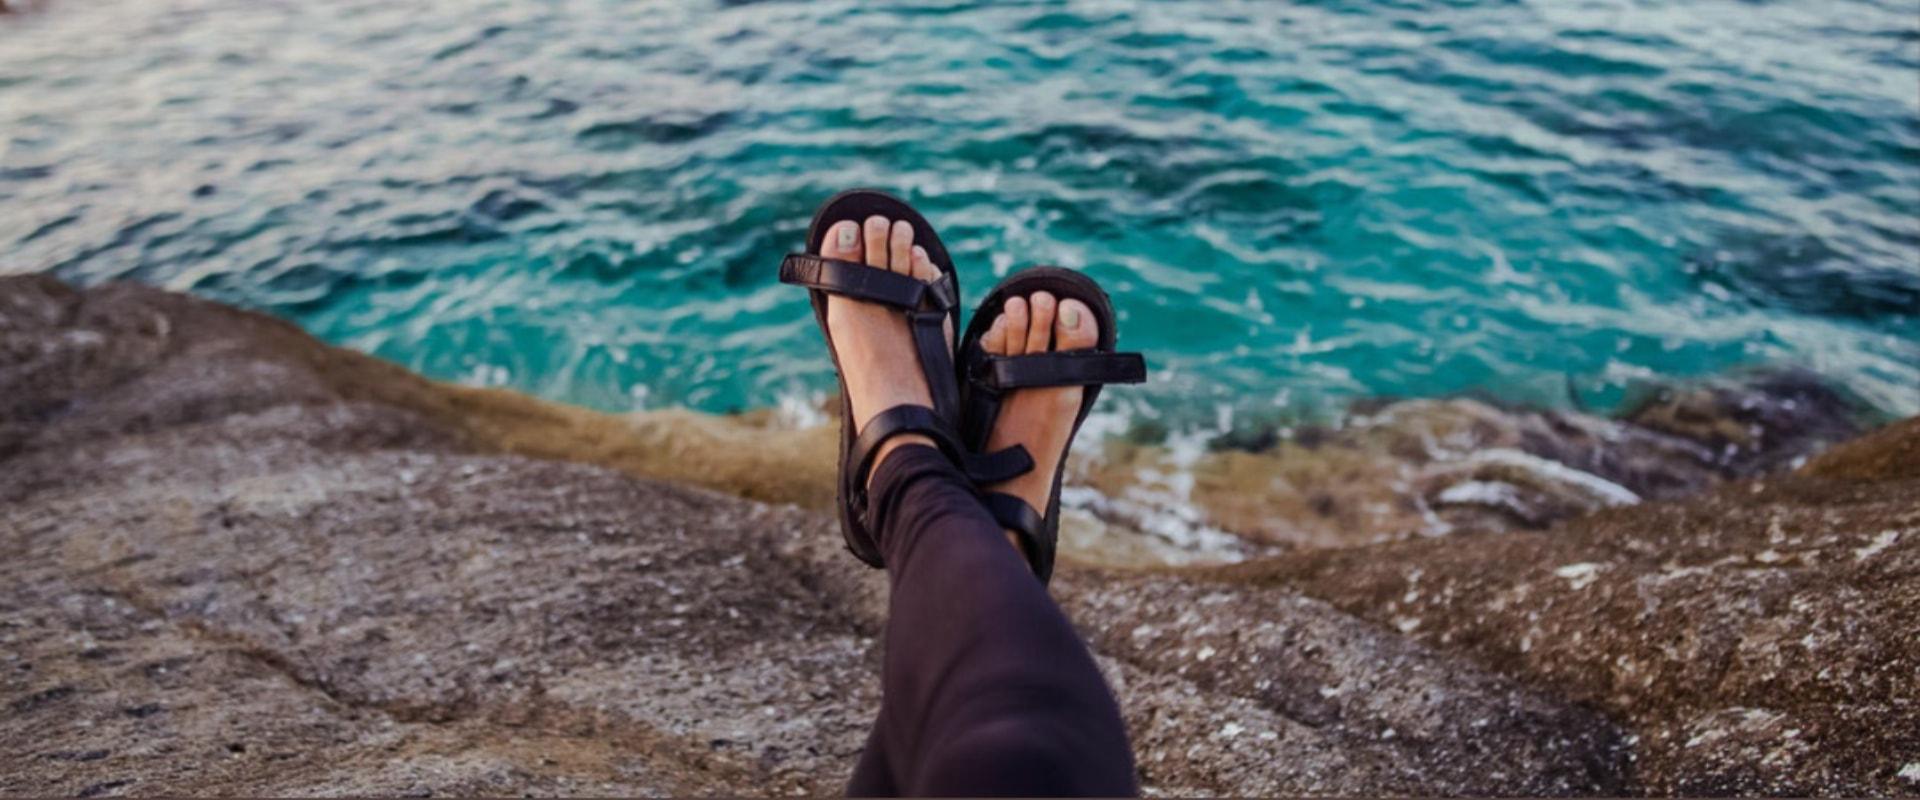 Best 2019Top Products Sandals Listed Reviewedamp; Hiking UzqSGMVp